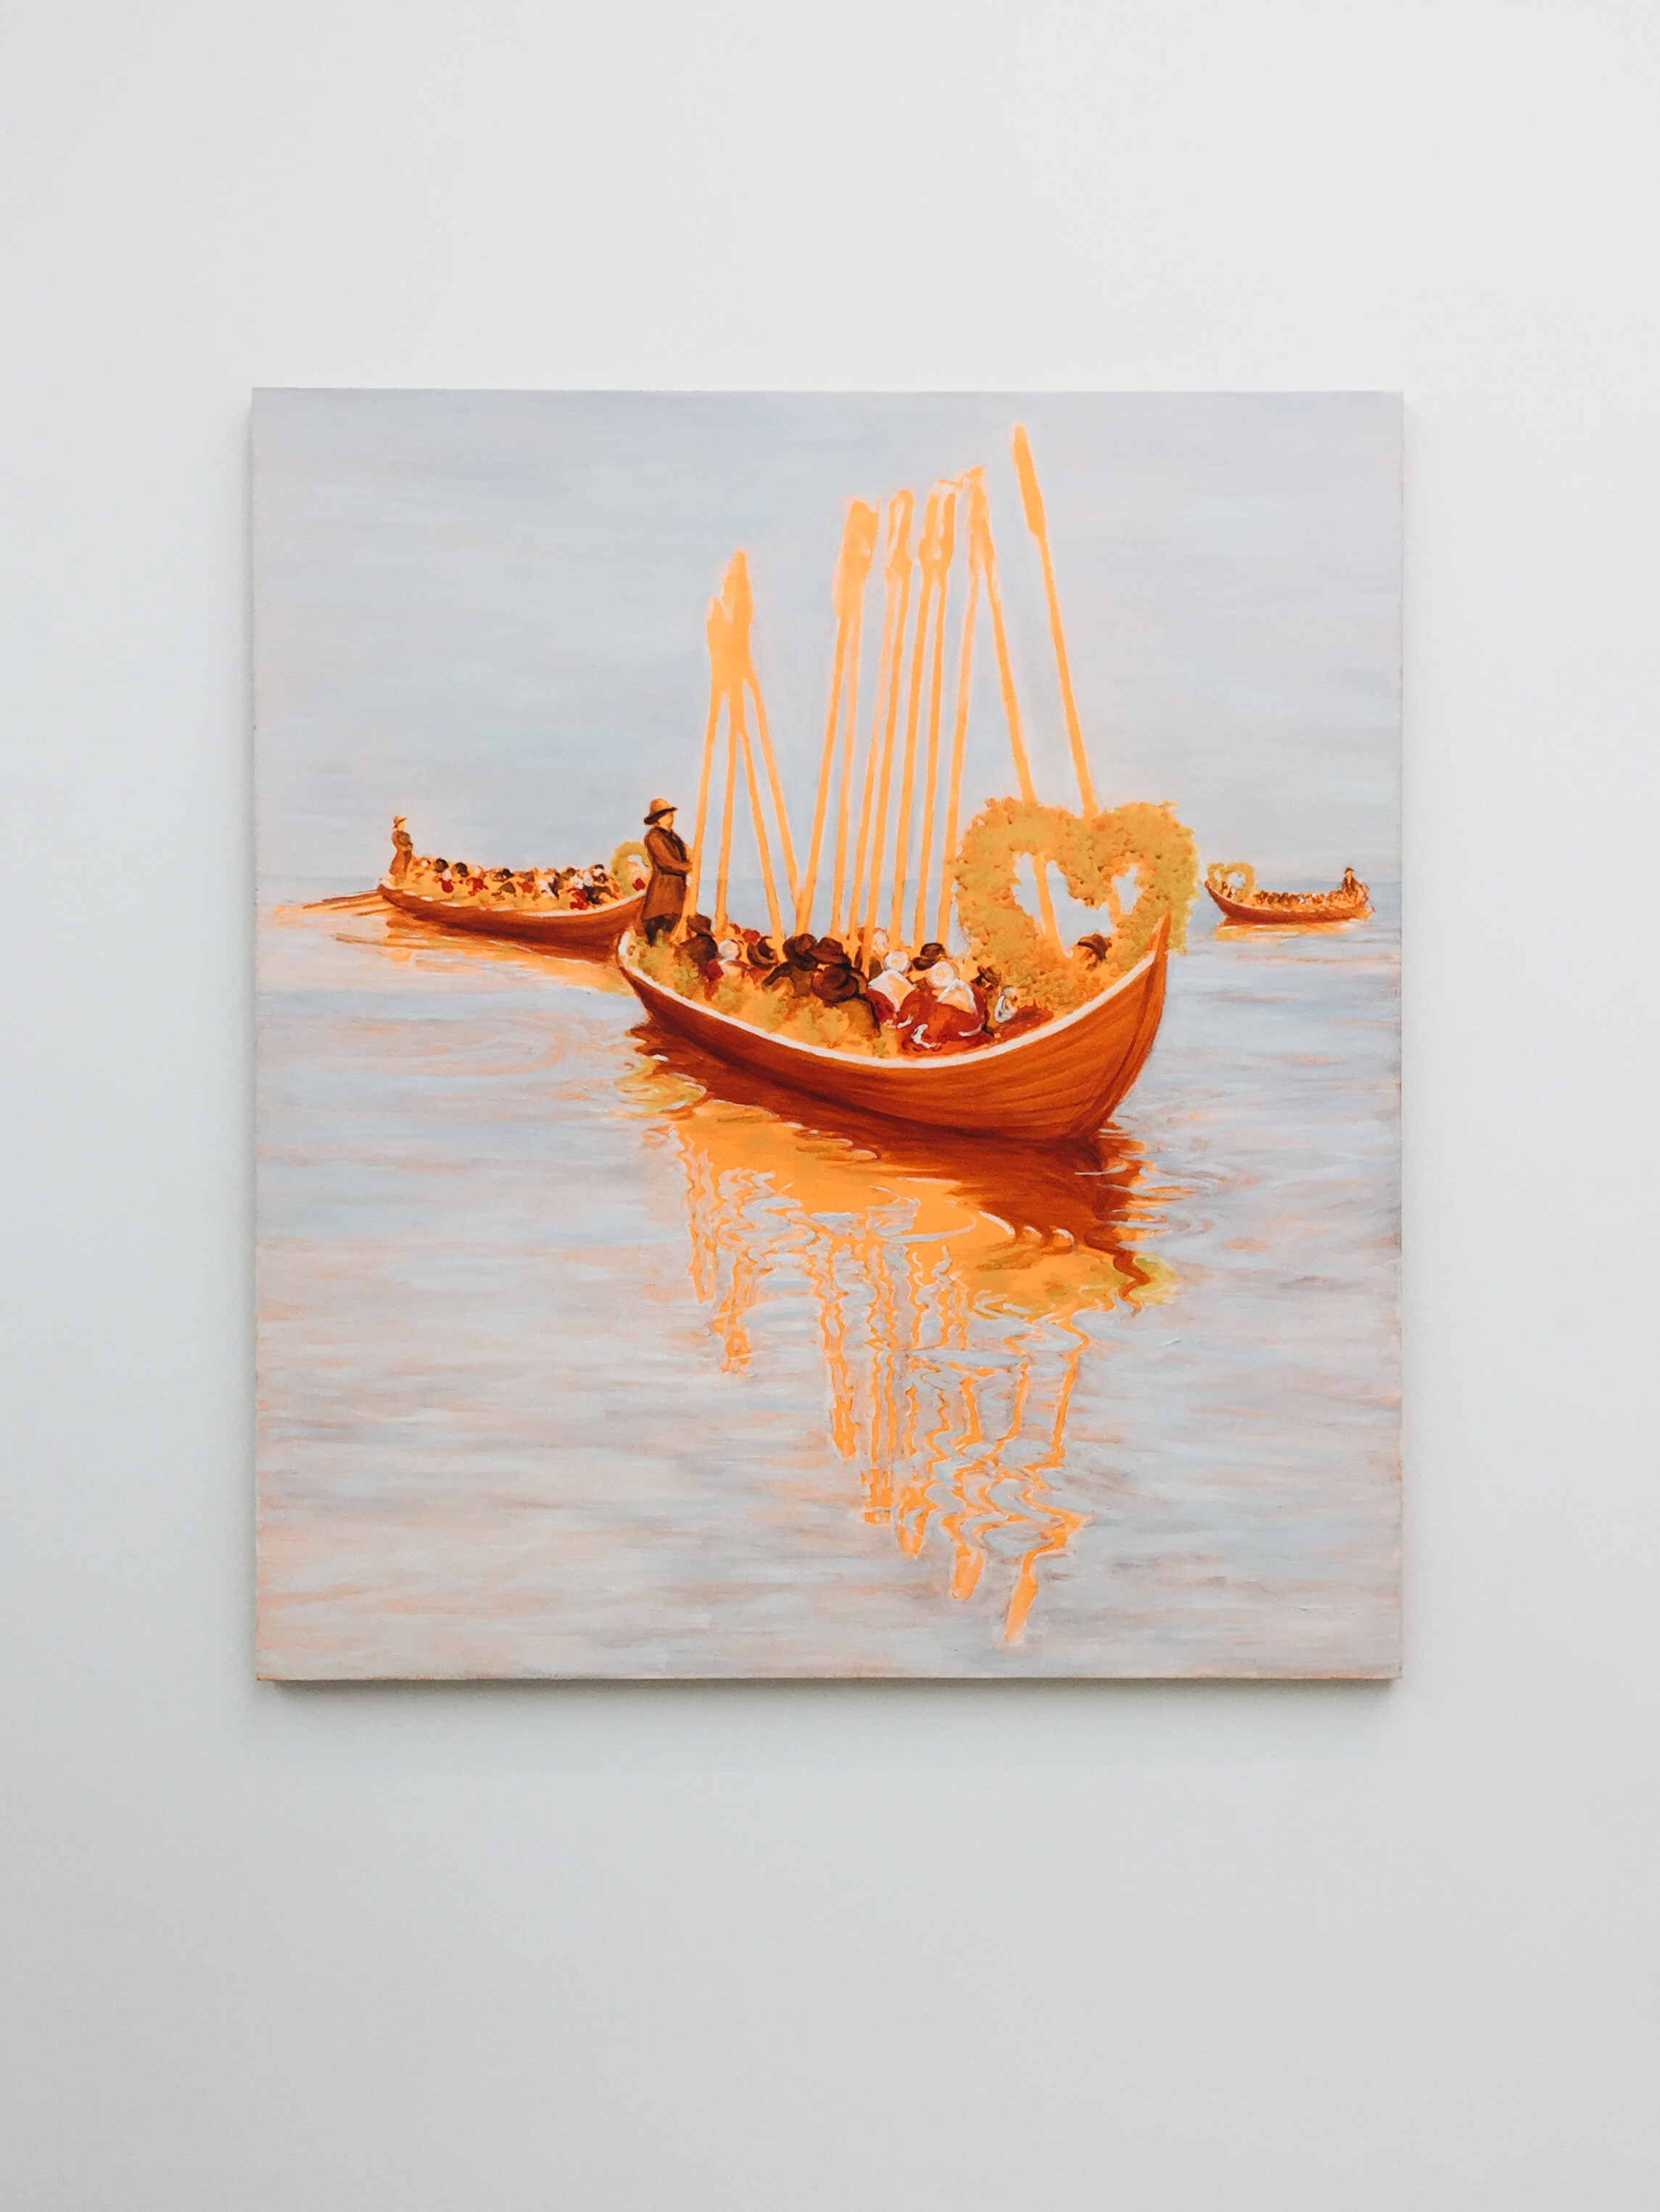 Church Boats by Sigrid Holmwood, 2007